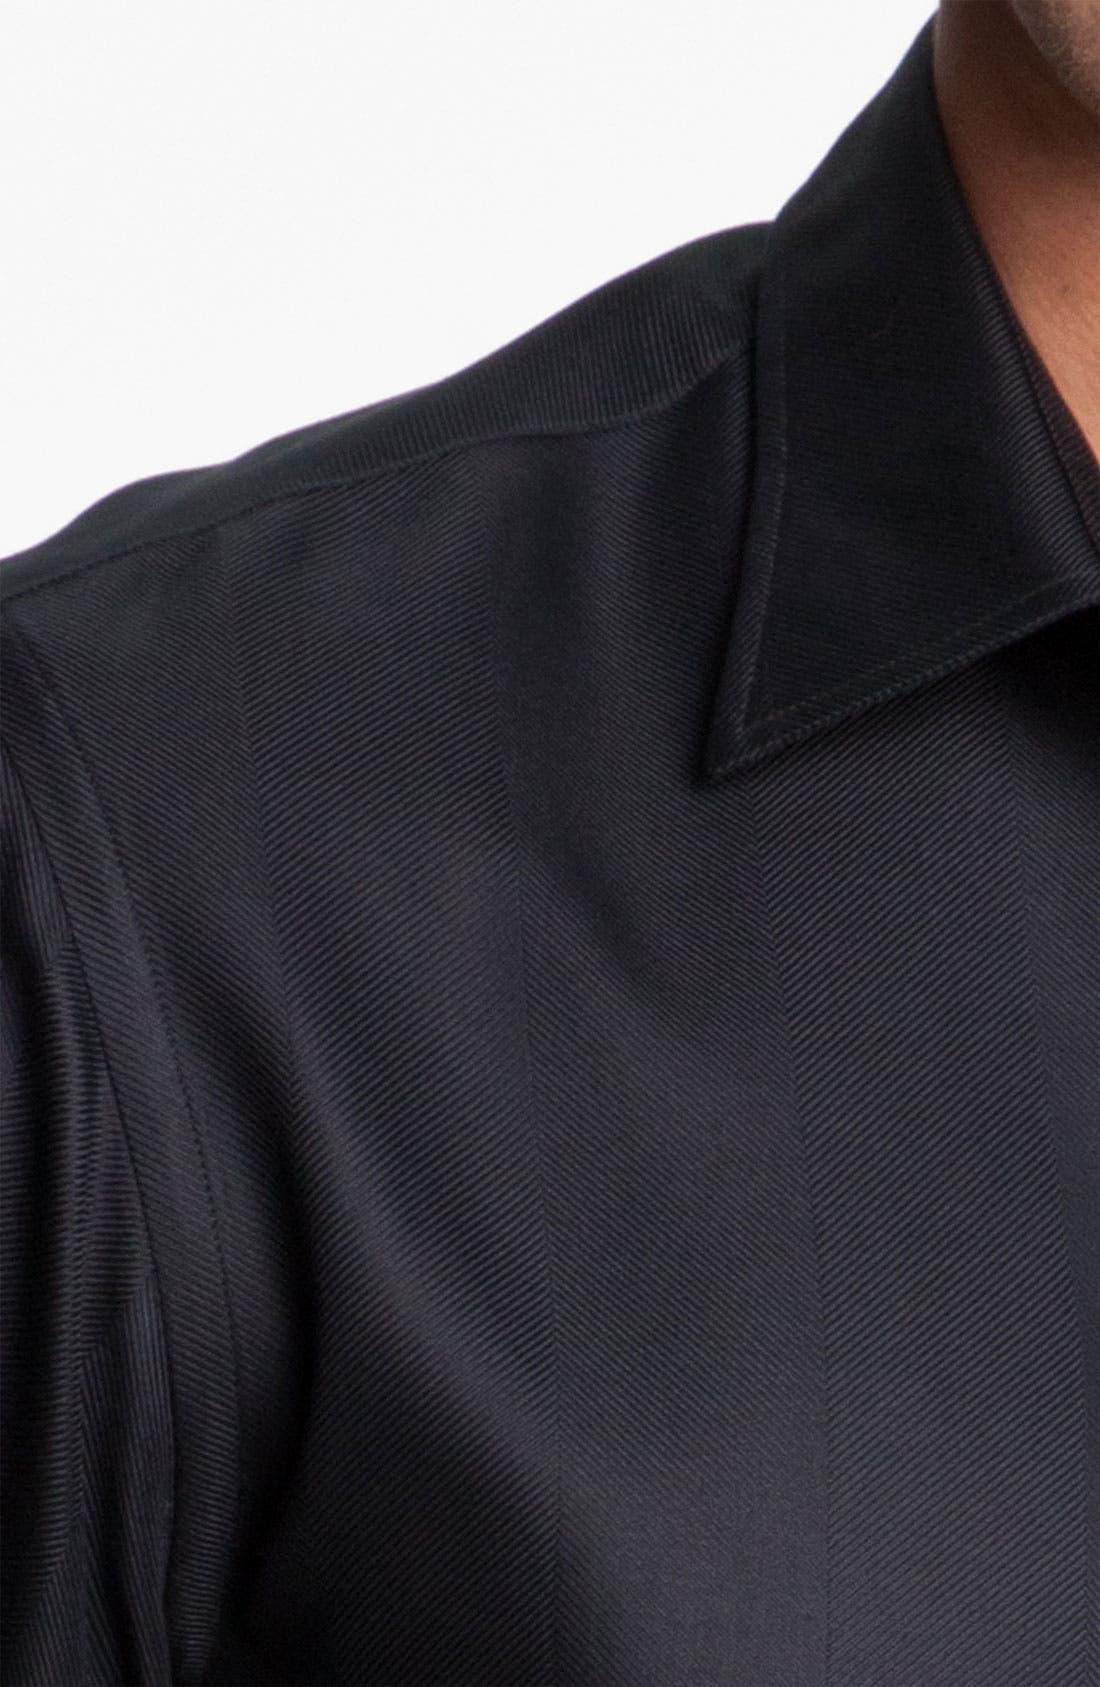 Alternate Image 3  - Armani Collezioni Herringbone Woven Shirt